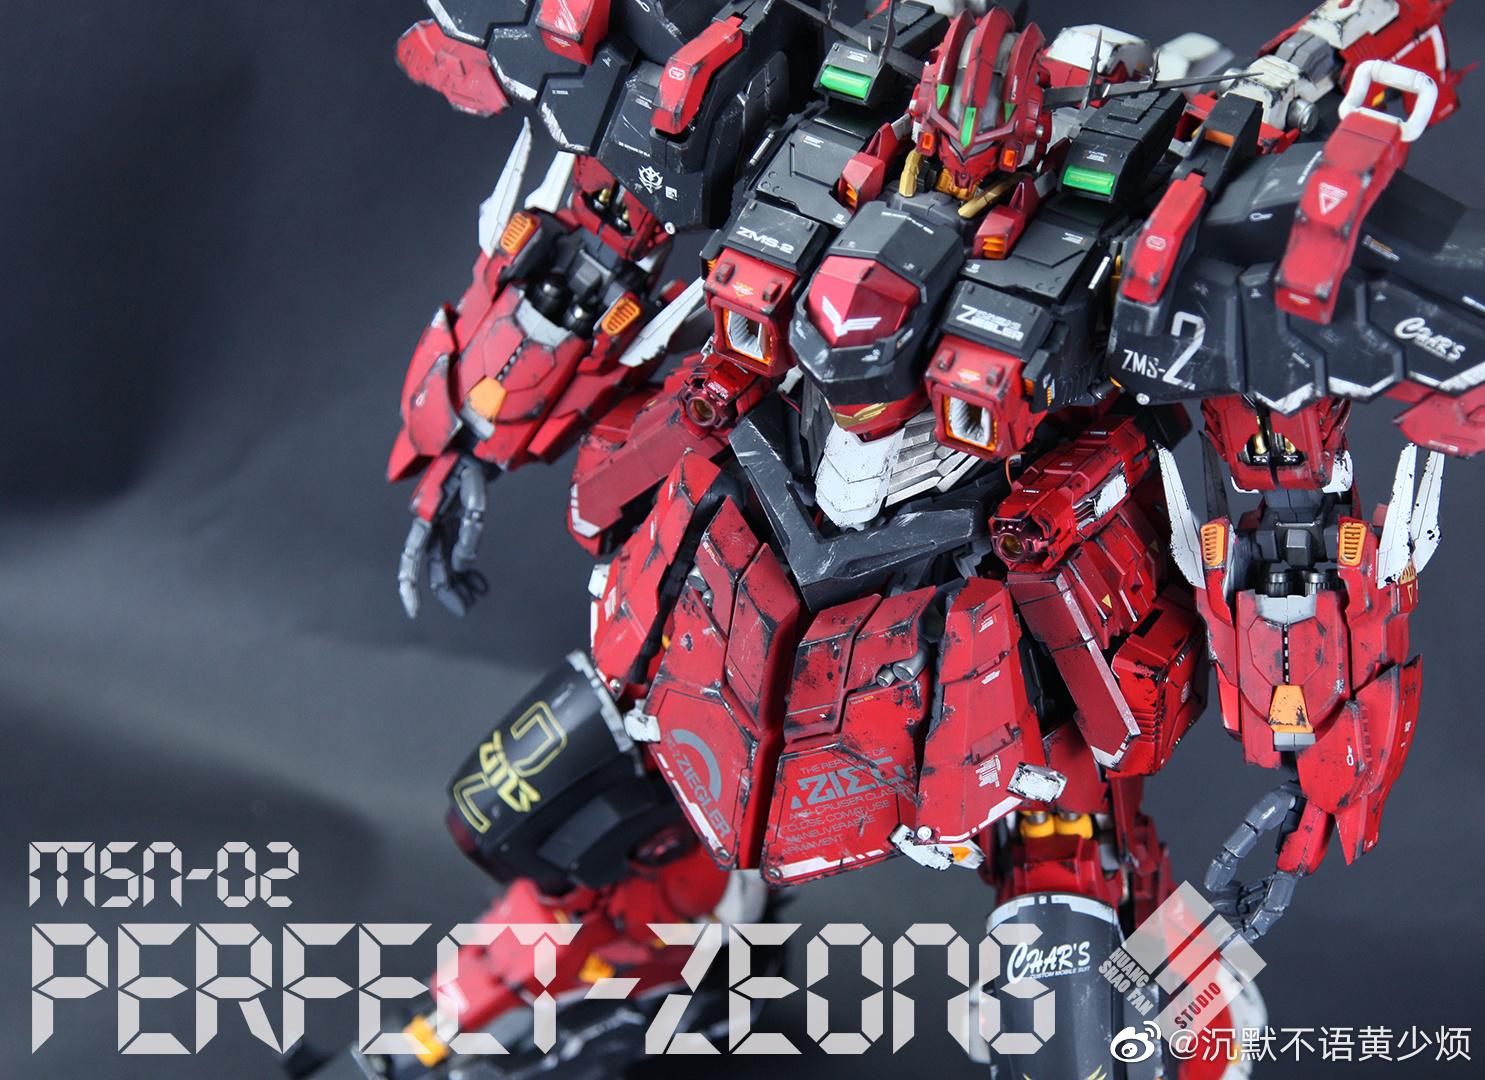 S164_2_mc_perfect_zeong_red_002.jpg